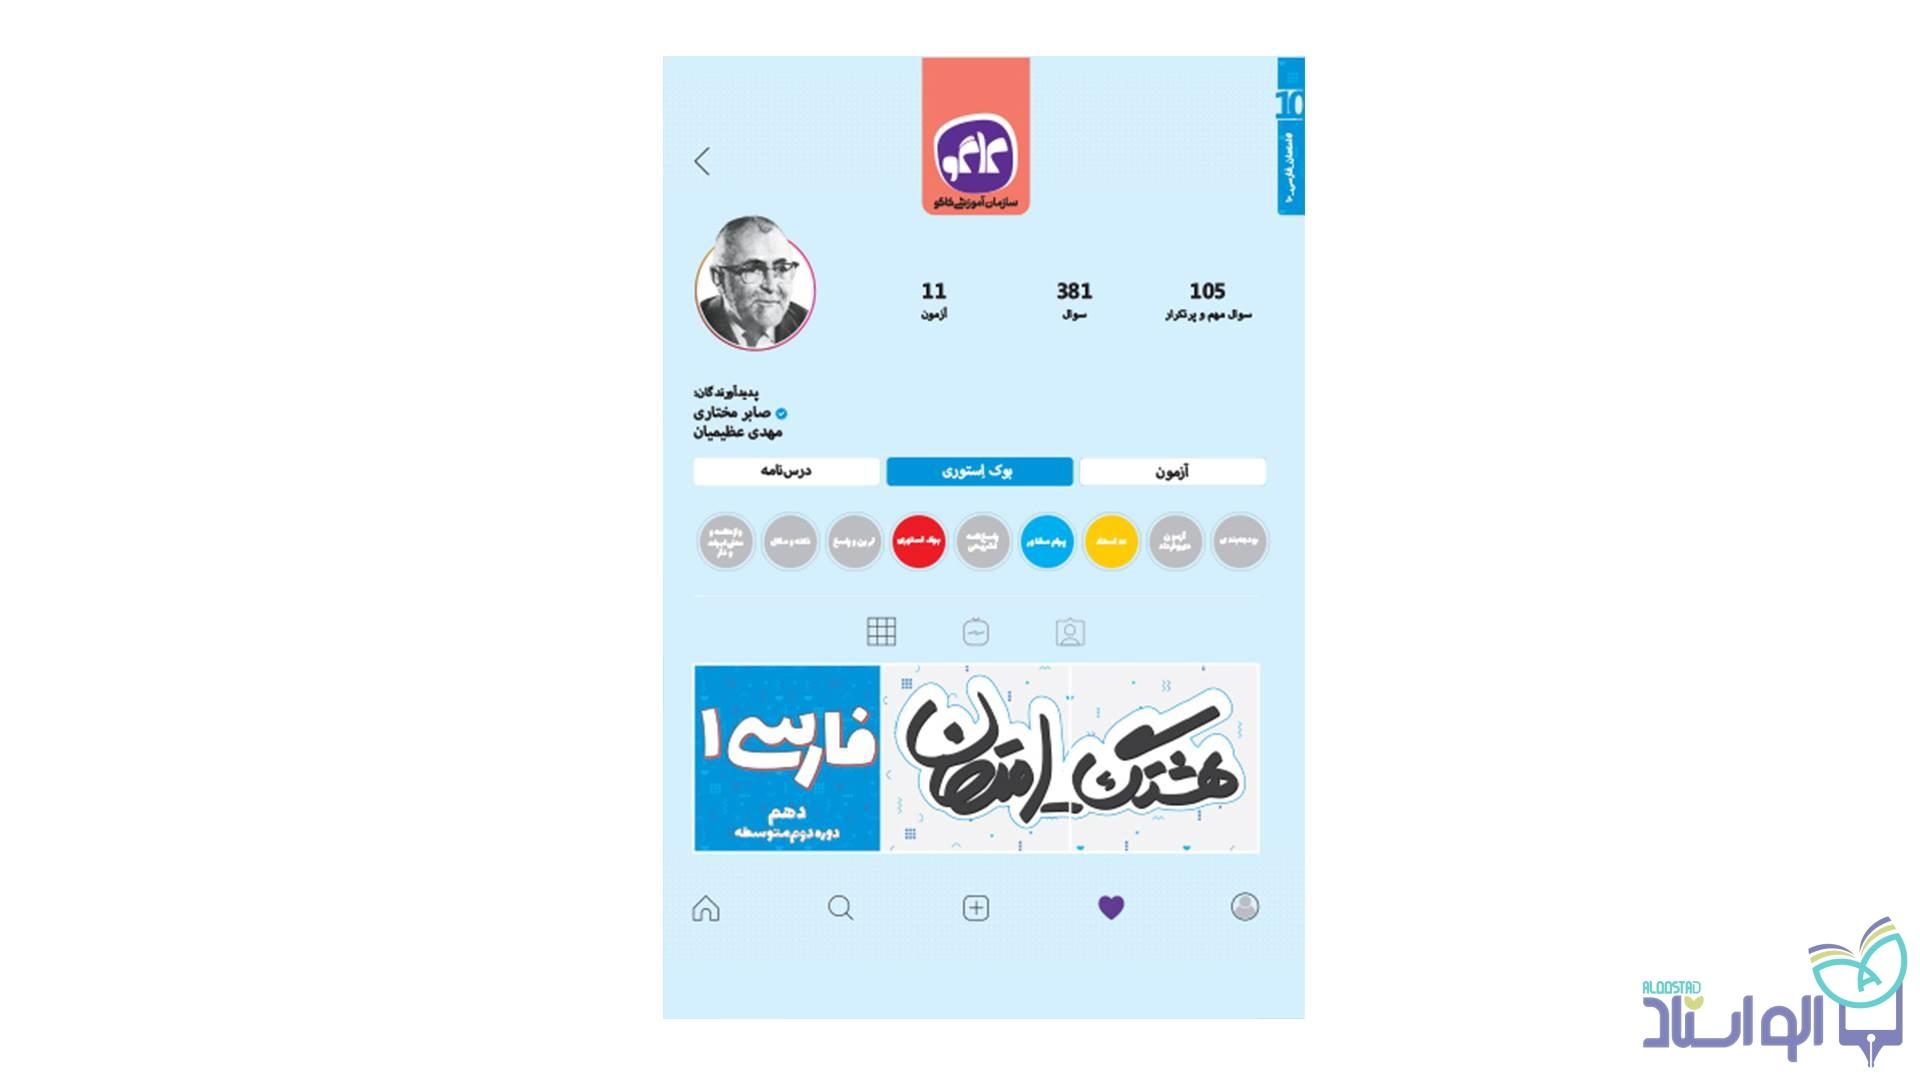 هشتگ - امتحان فارسی 1 دهم